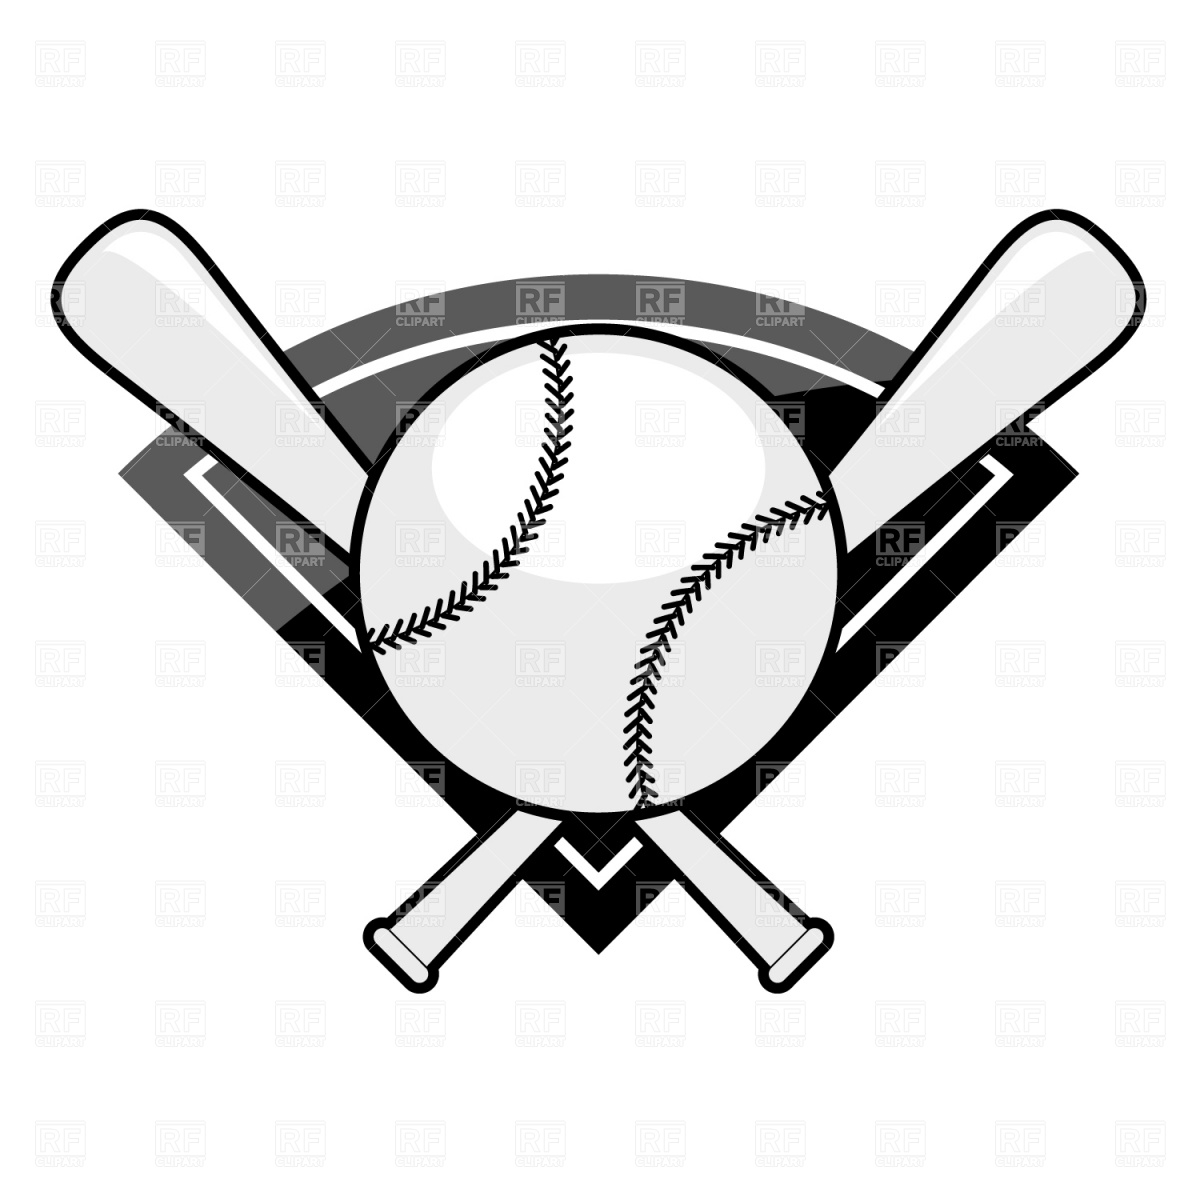 Bat black and white crossed baseball bats clipart black and ... banner black and white